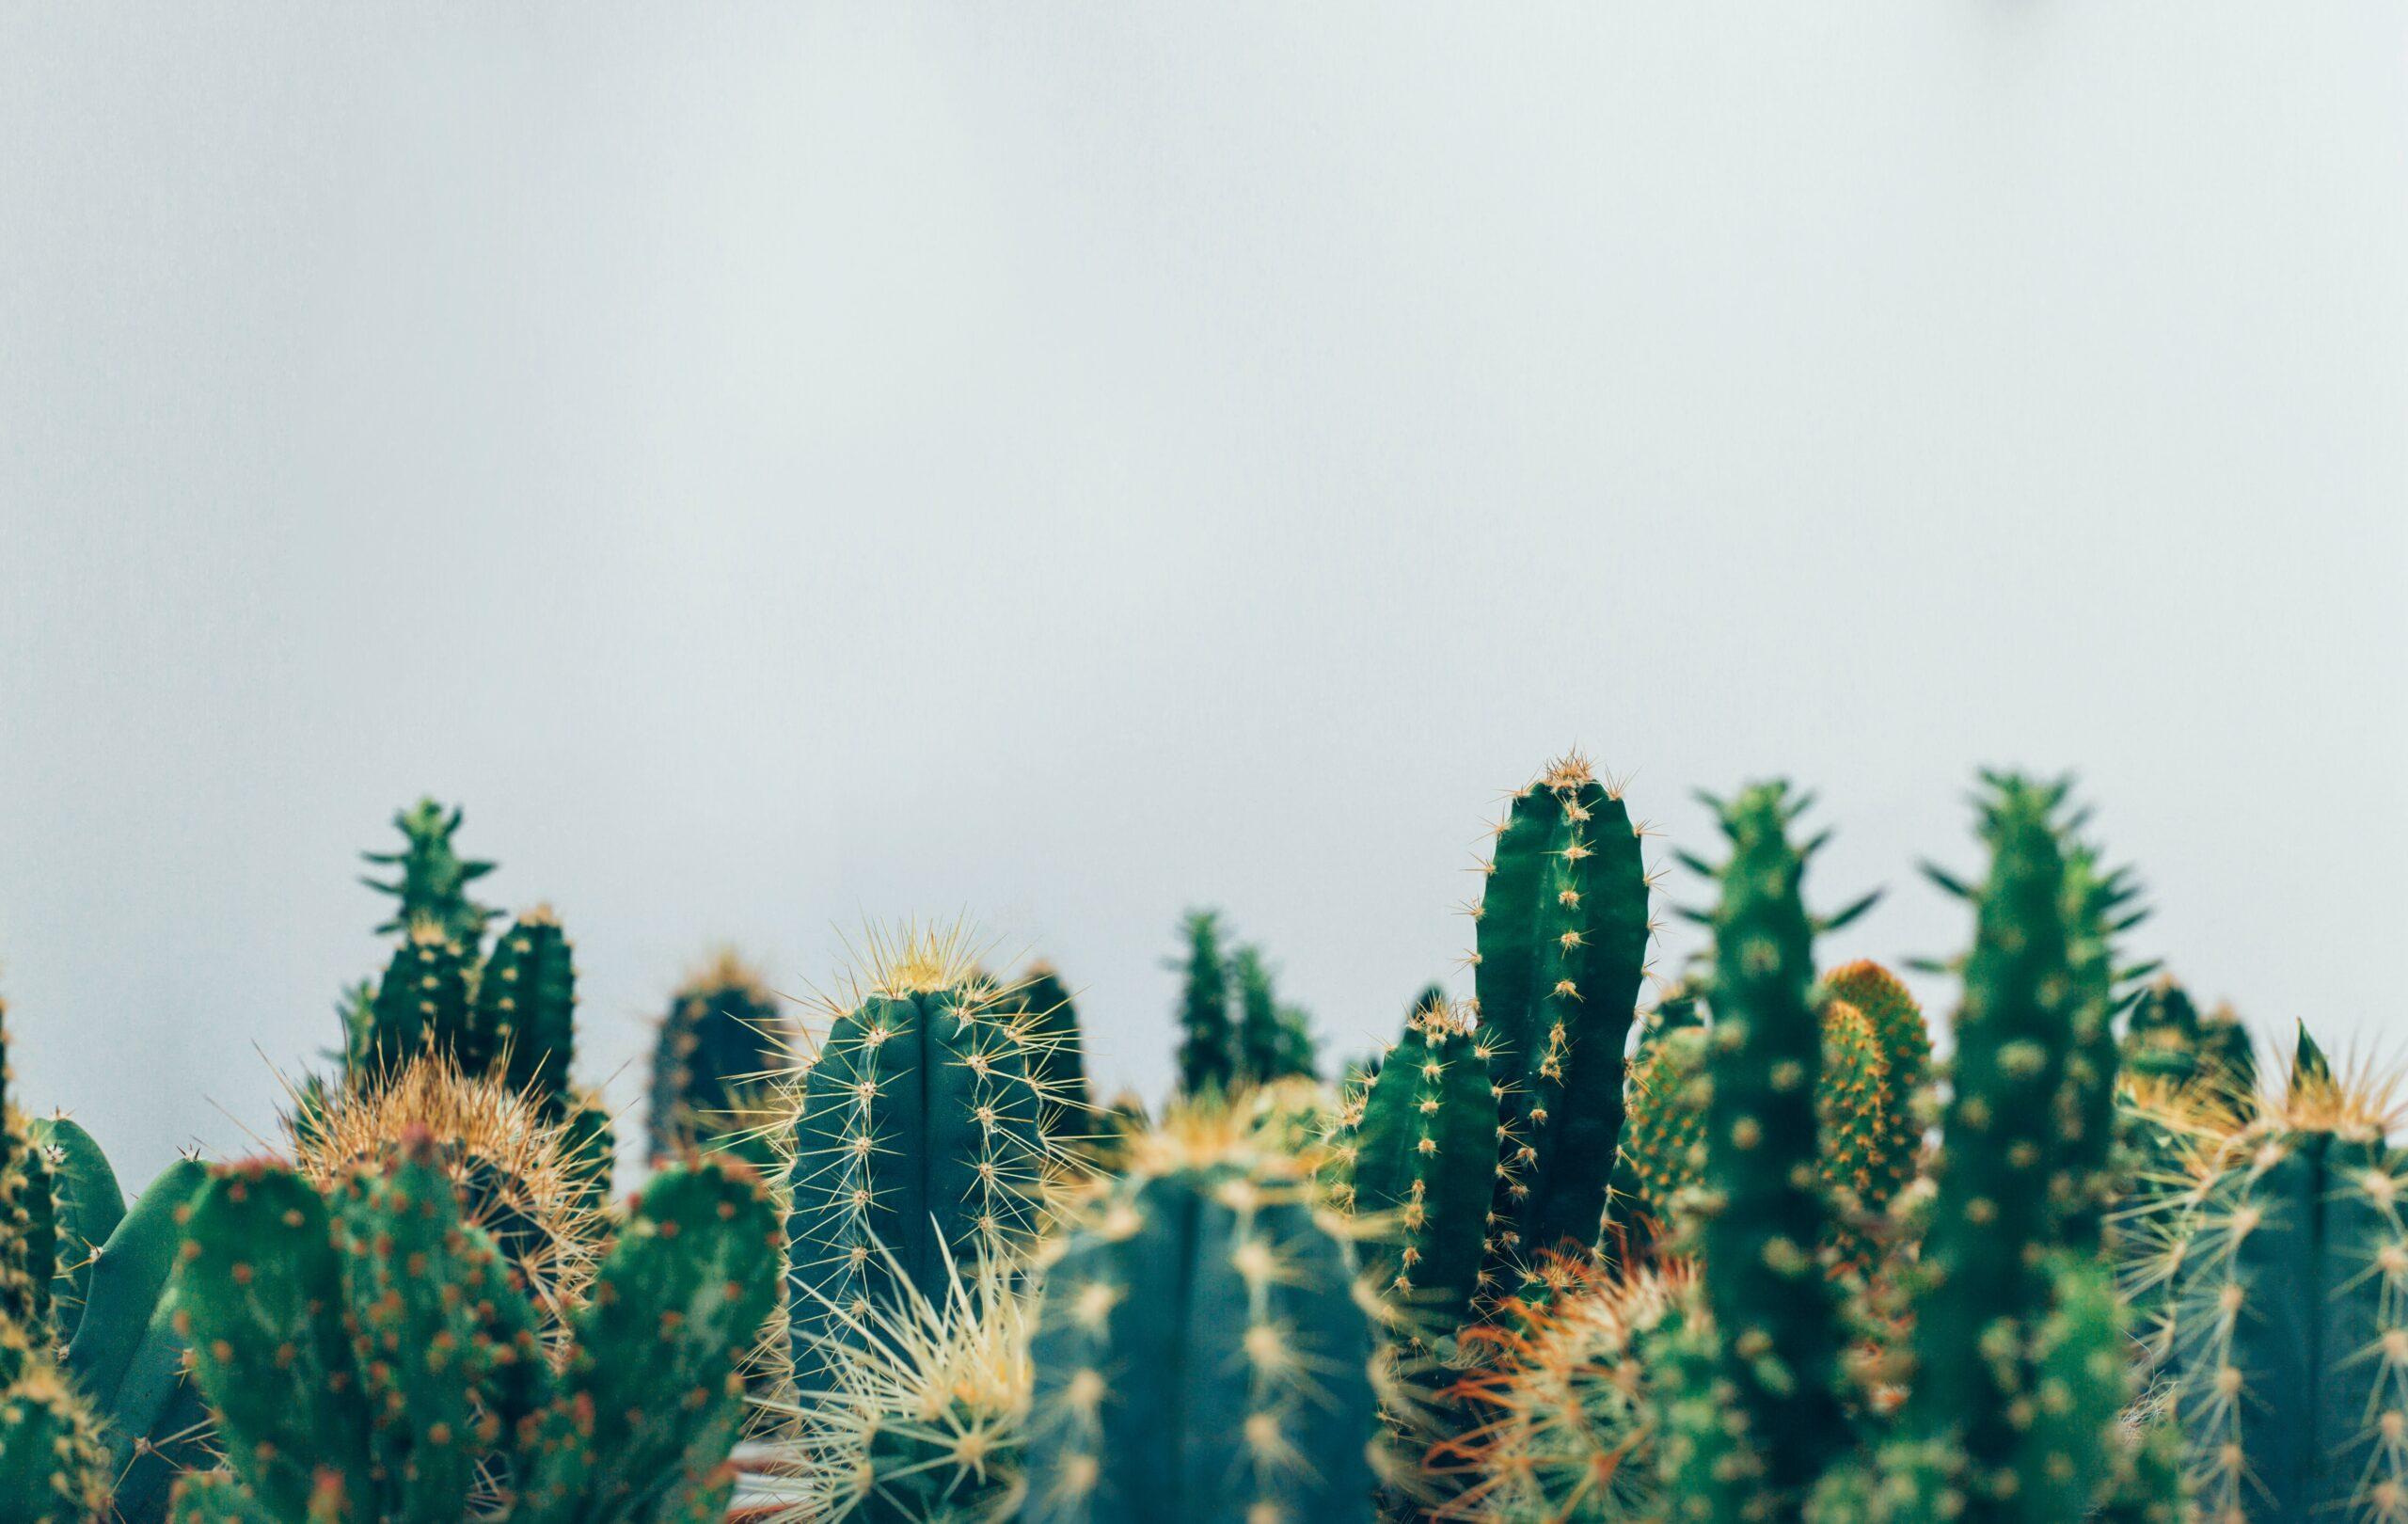 cacti in a desert